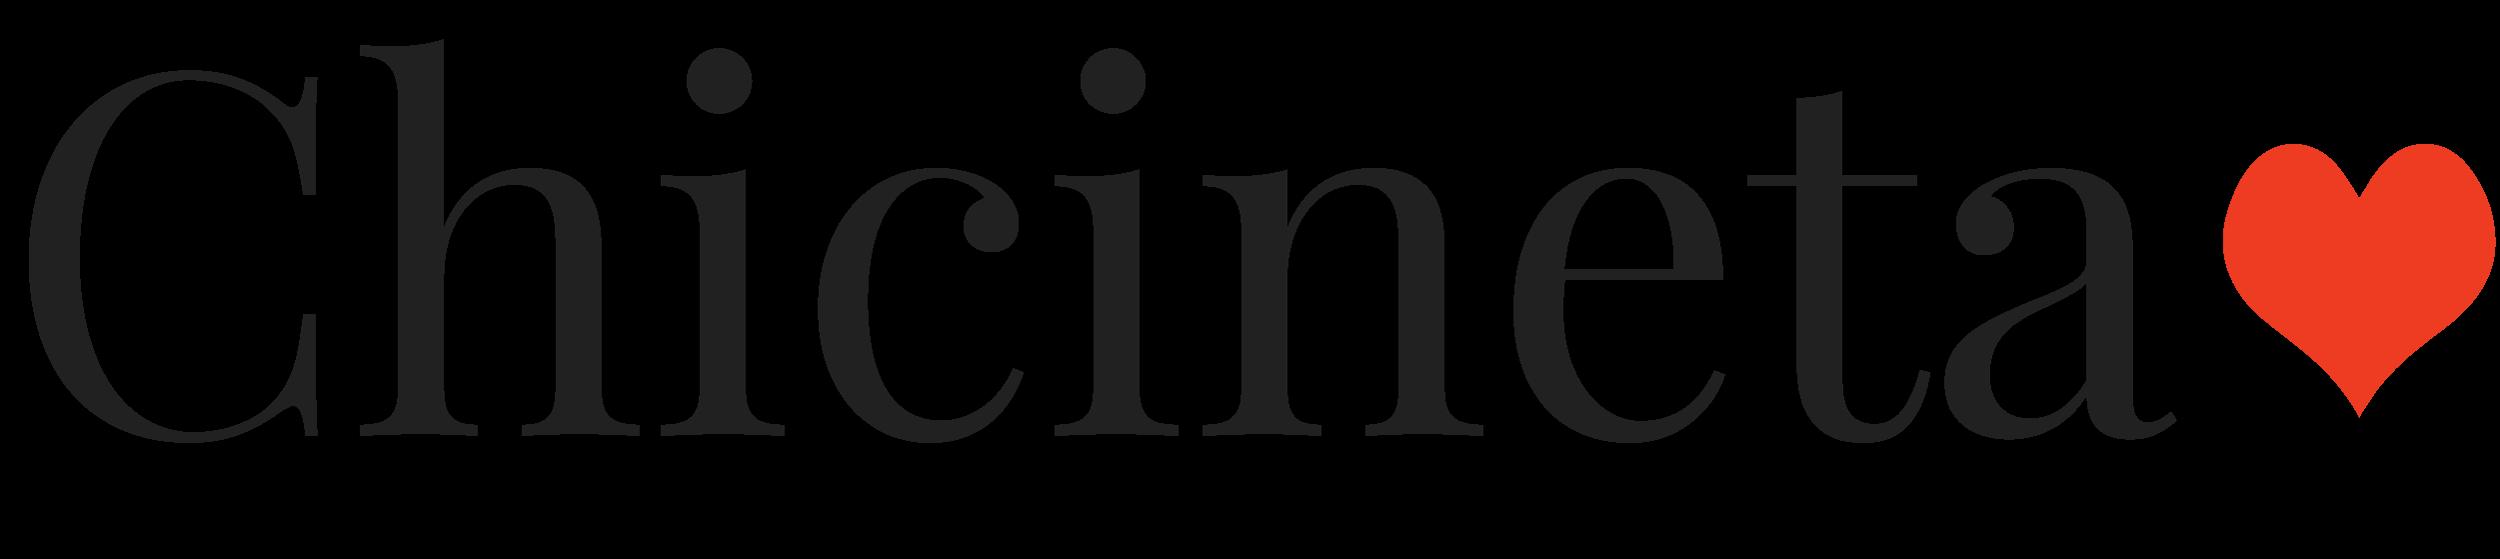 Chicineta